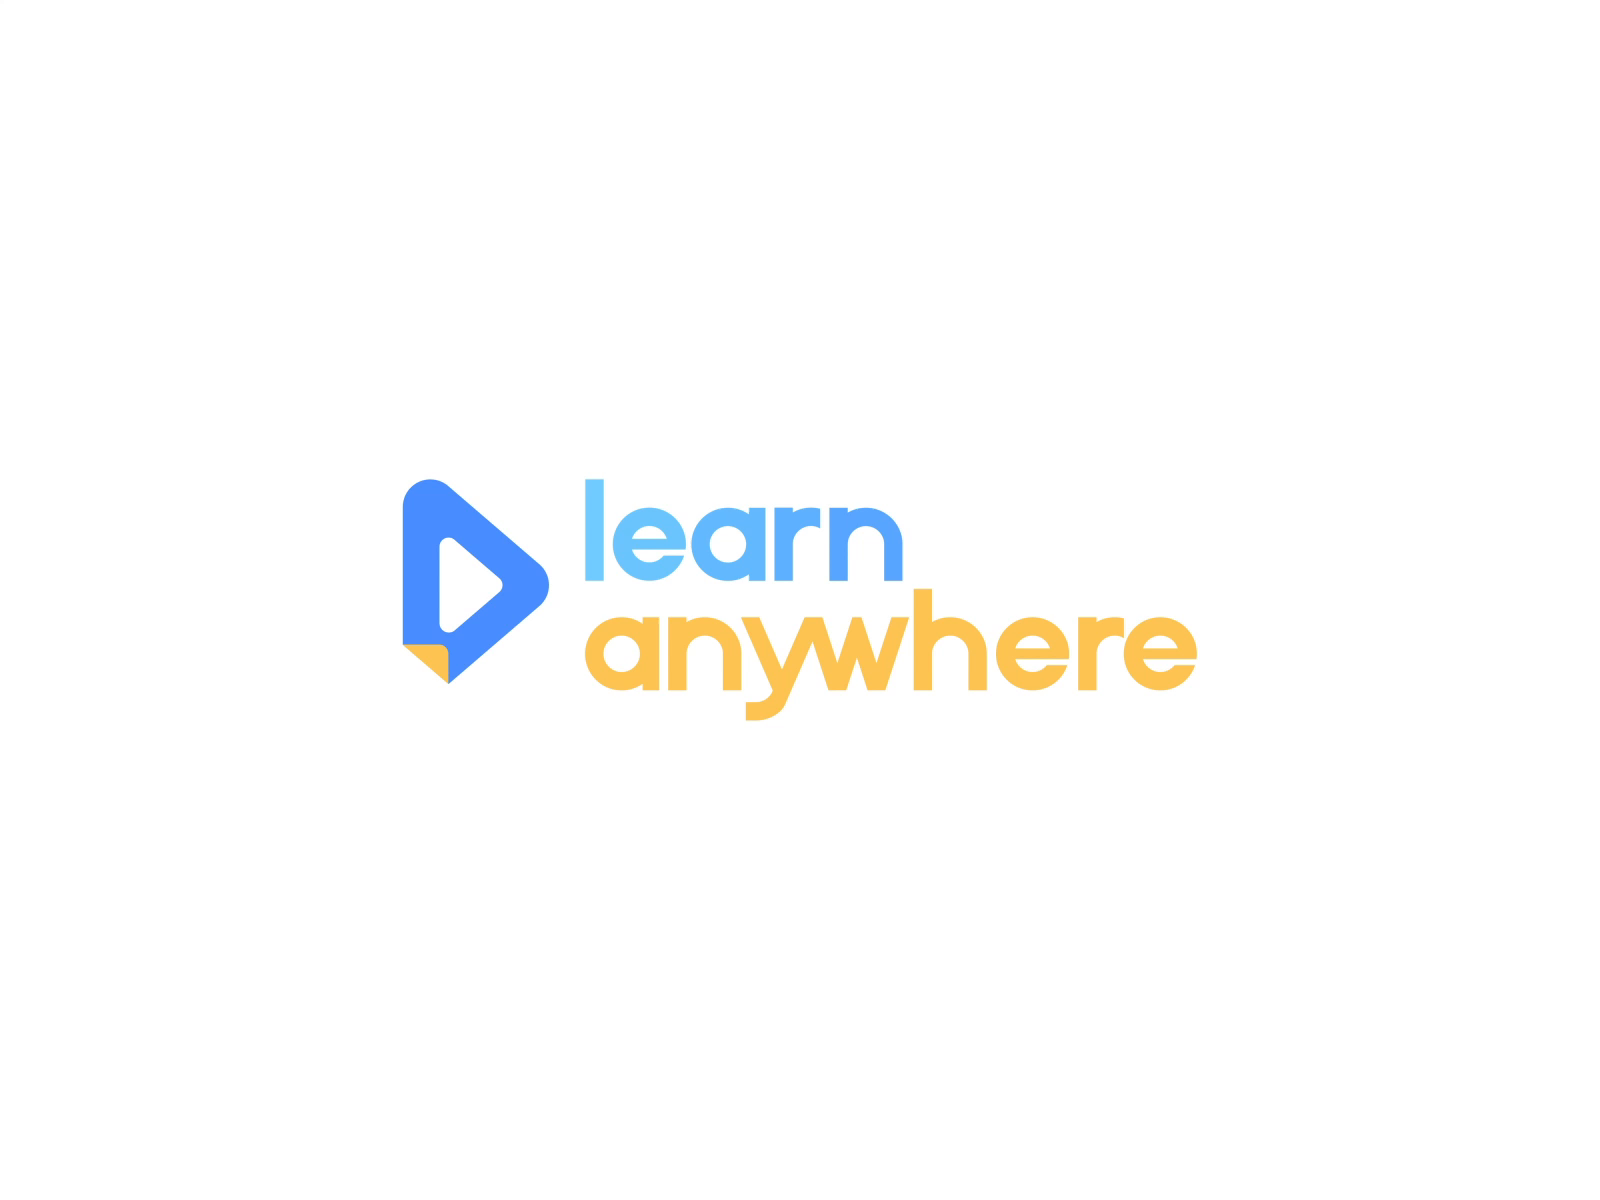 Learn Anywhere by Ekkrit Foonngern for Skooldio on Dribbble